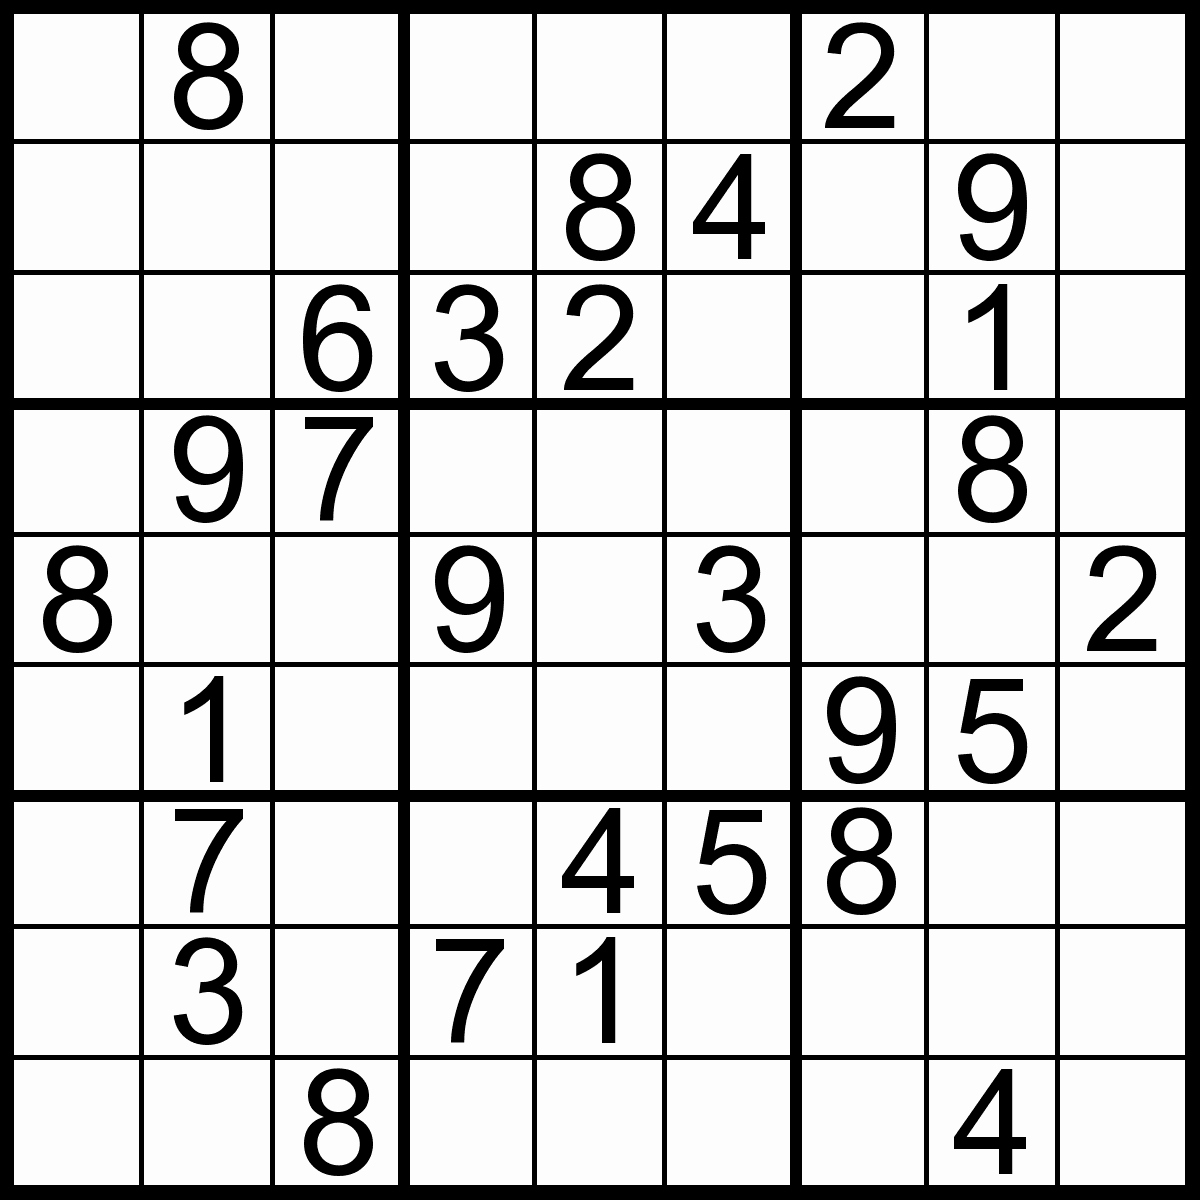 Kenken Puzzles Printable 5x5